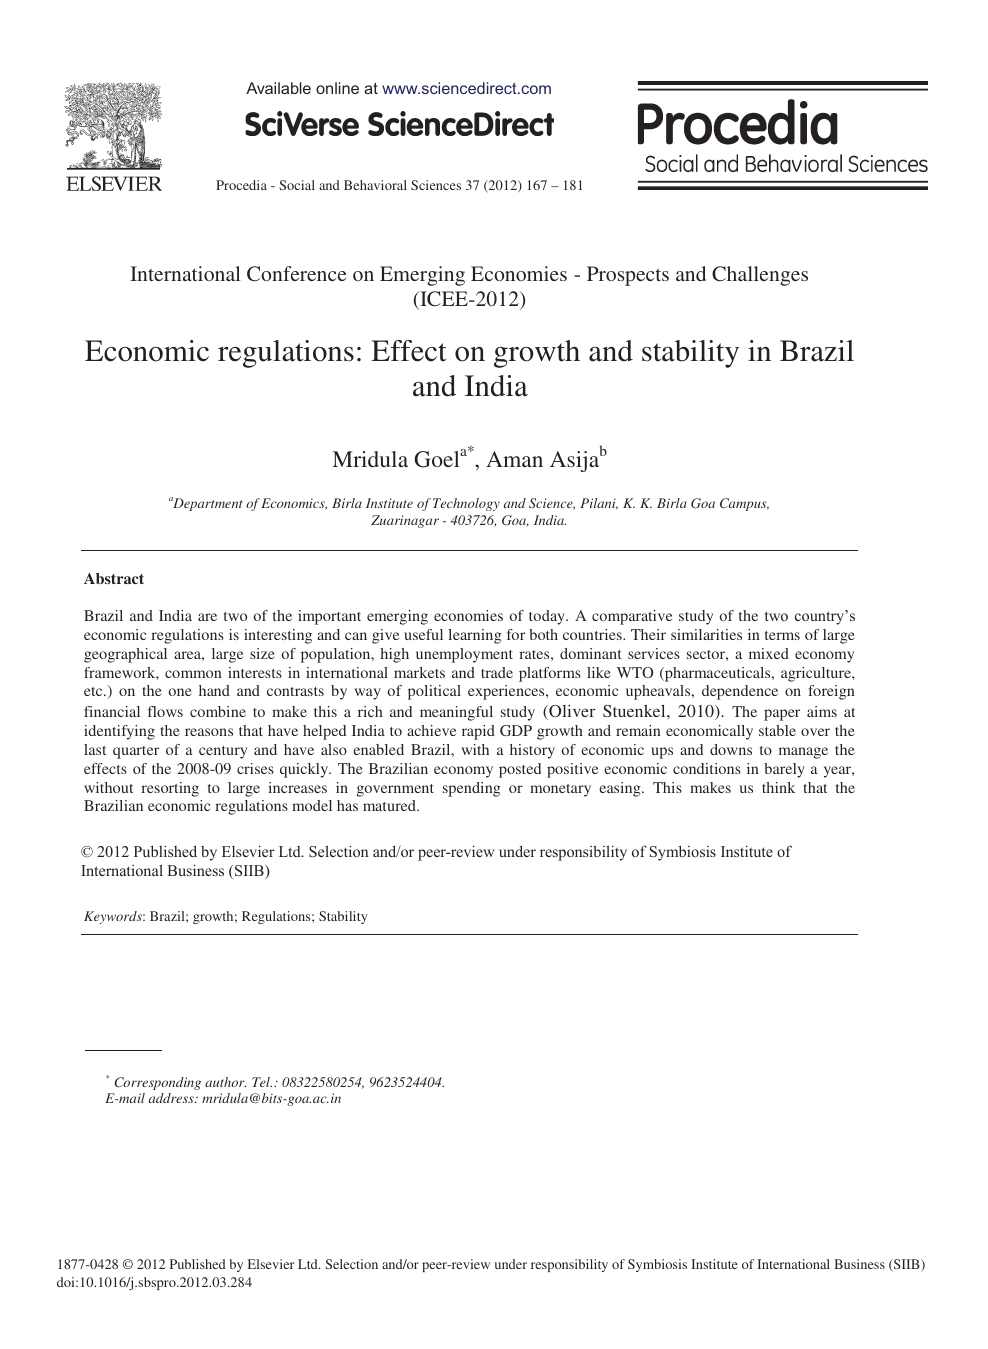 brazil mixed economy